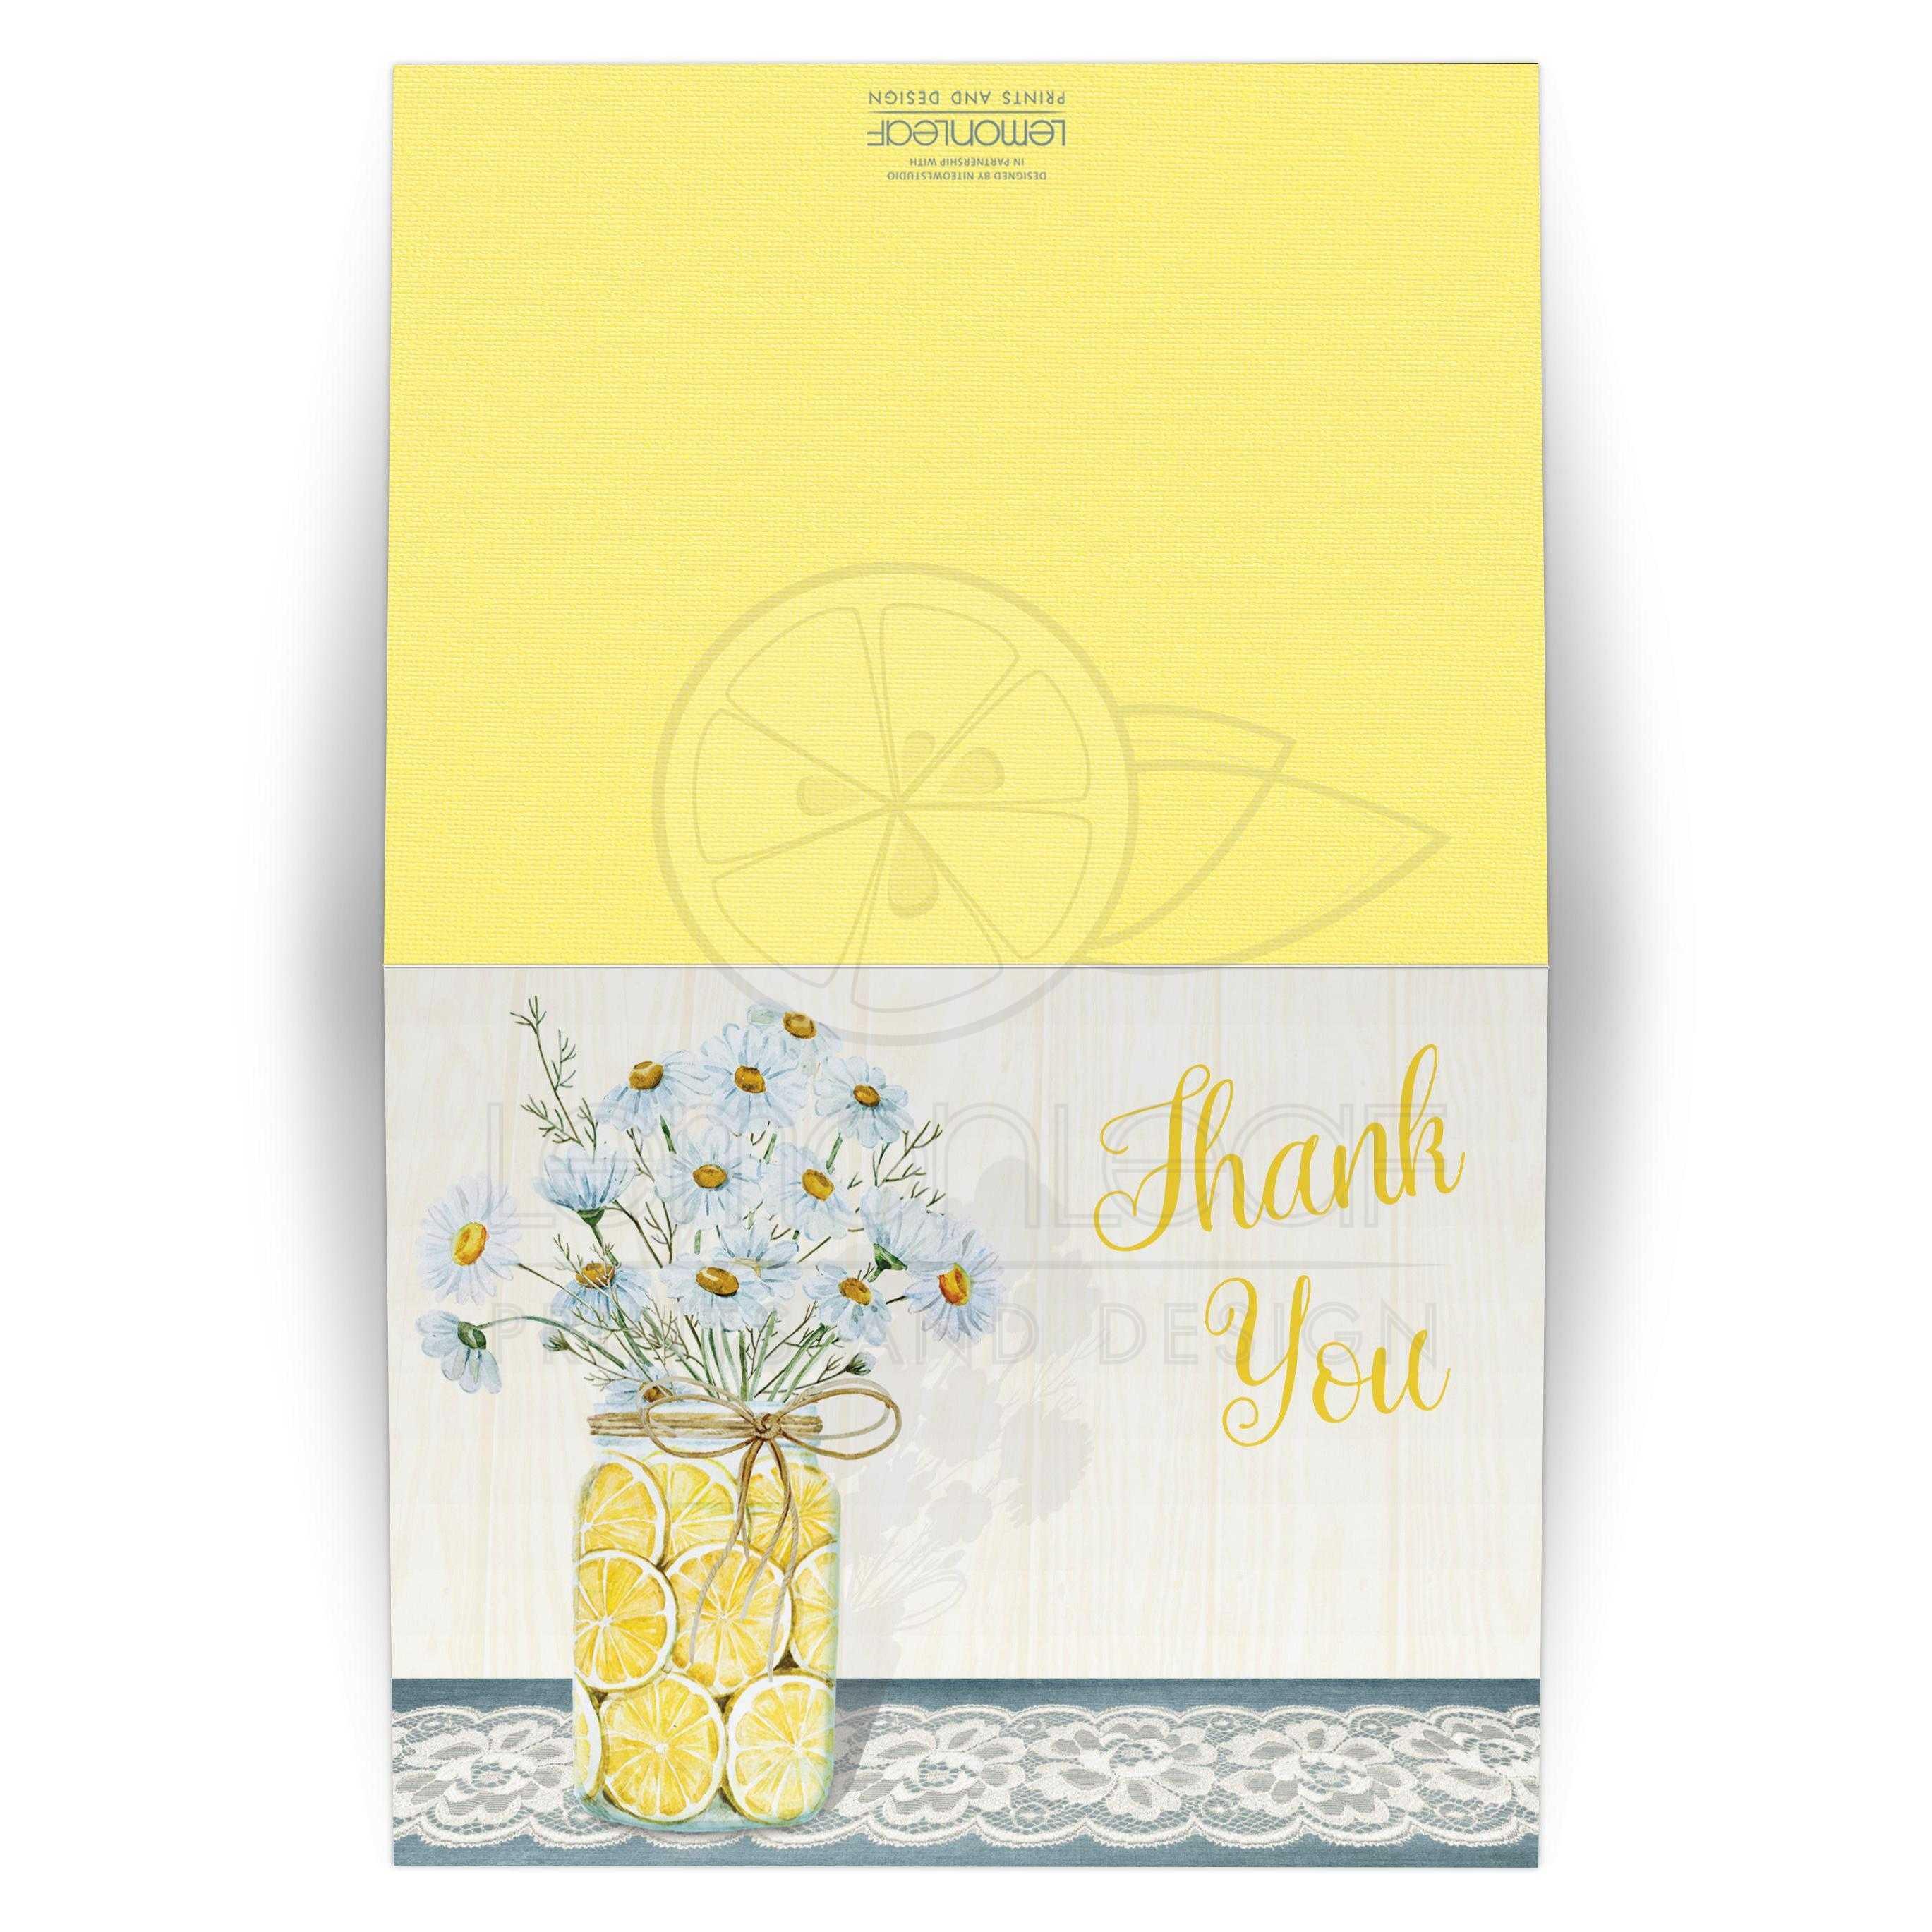 Shabby Chic Wedding Thank You Card Daisies Lace Denim Lemons